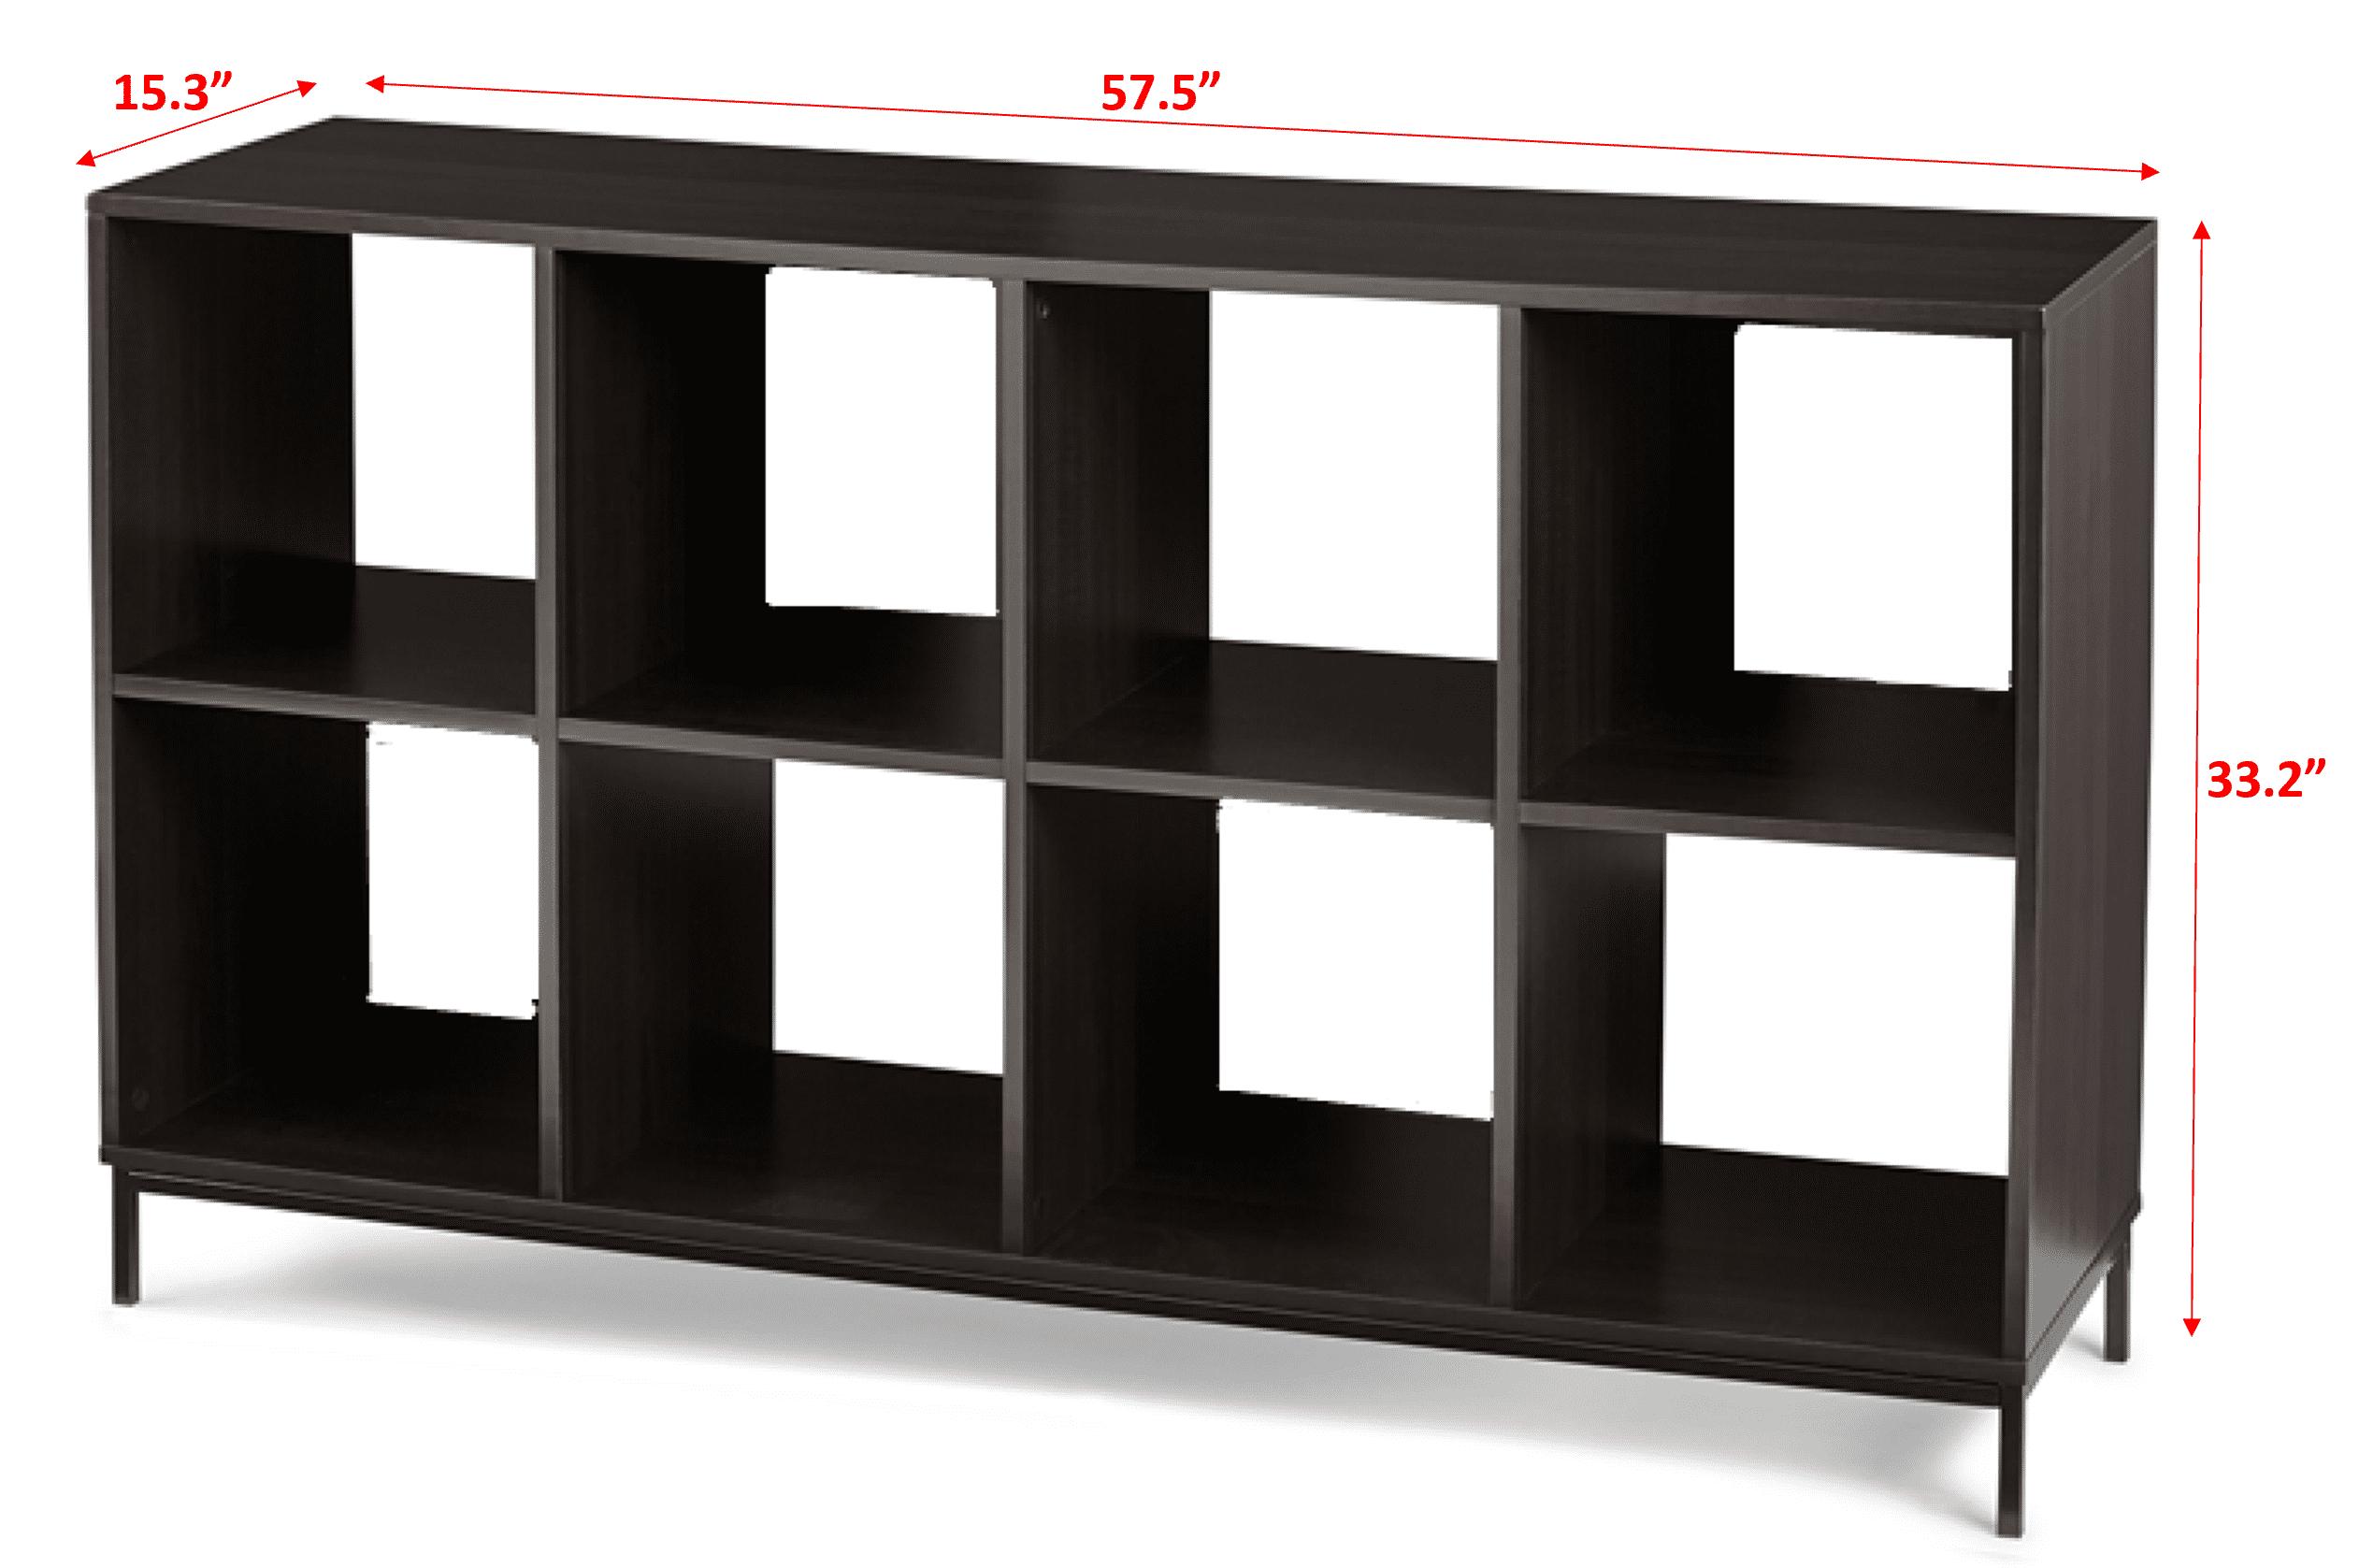 8 Cube Storage Organizer Bookshelf Rack Home /& Garden Bookcase Cabinet Shelves